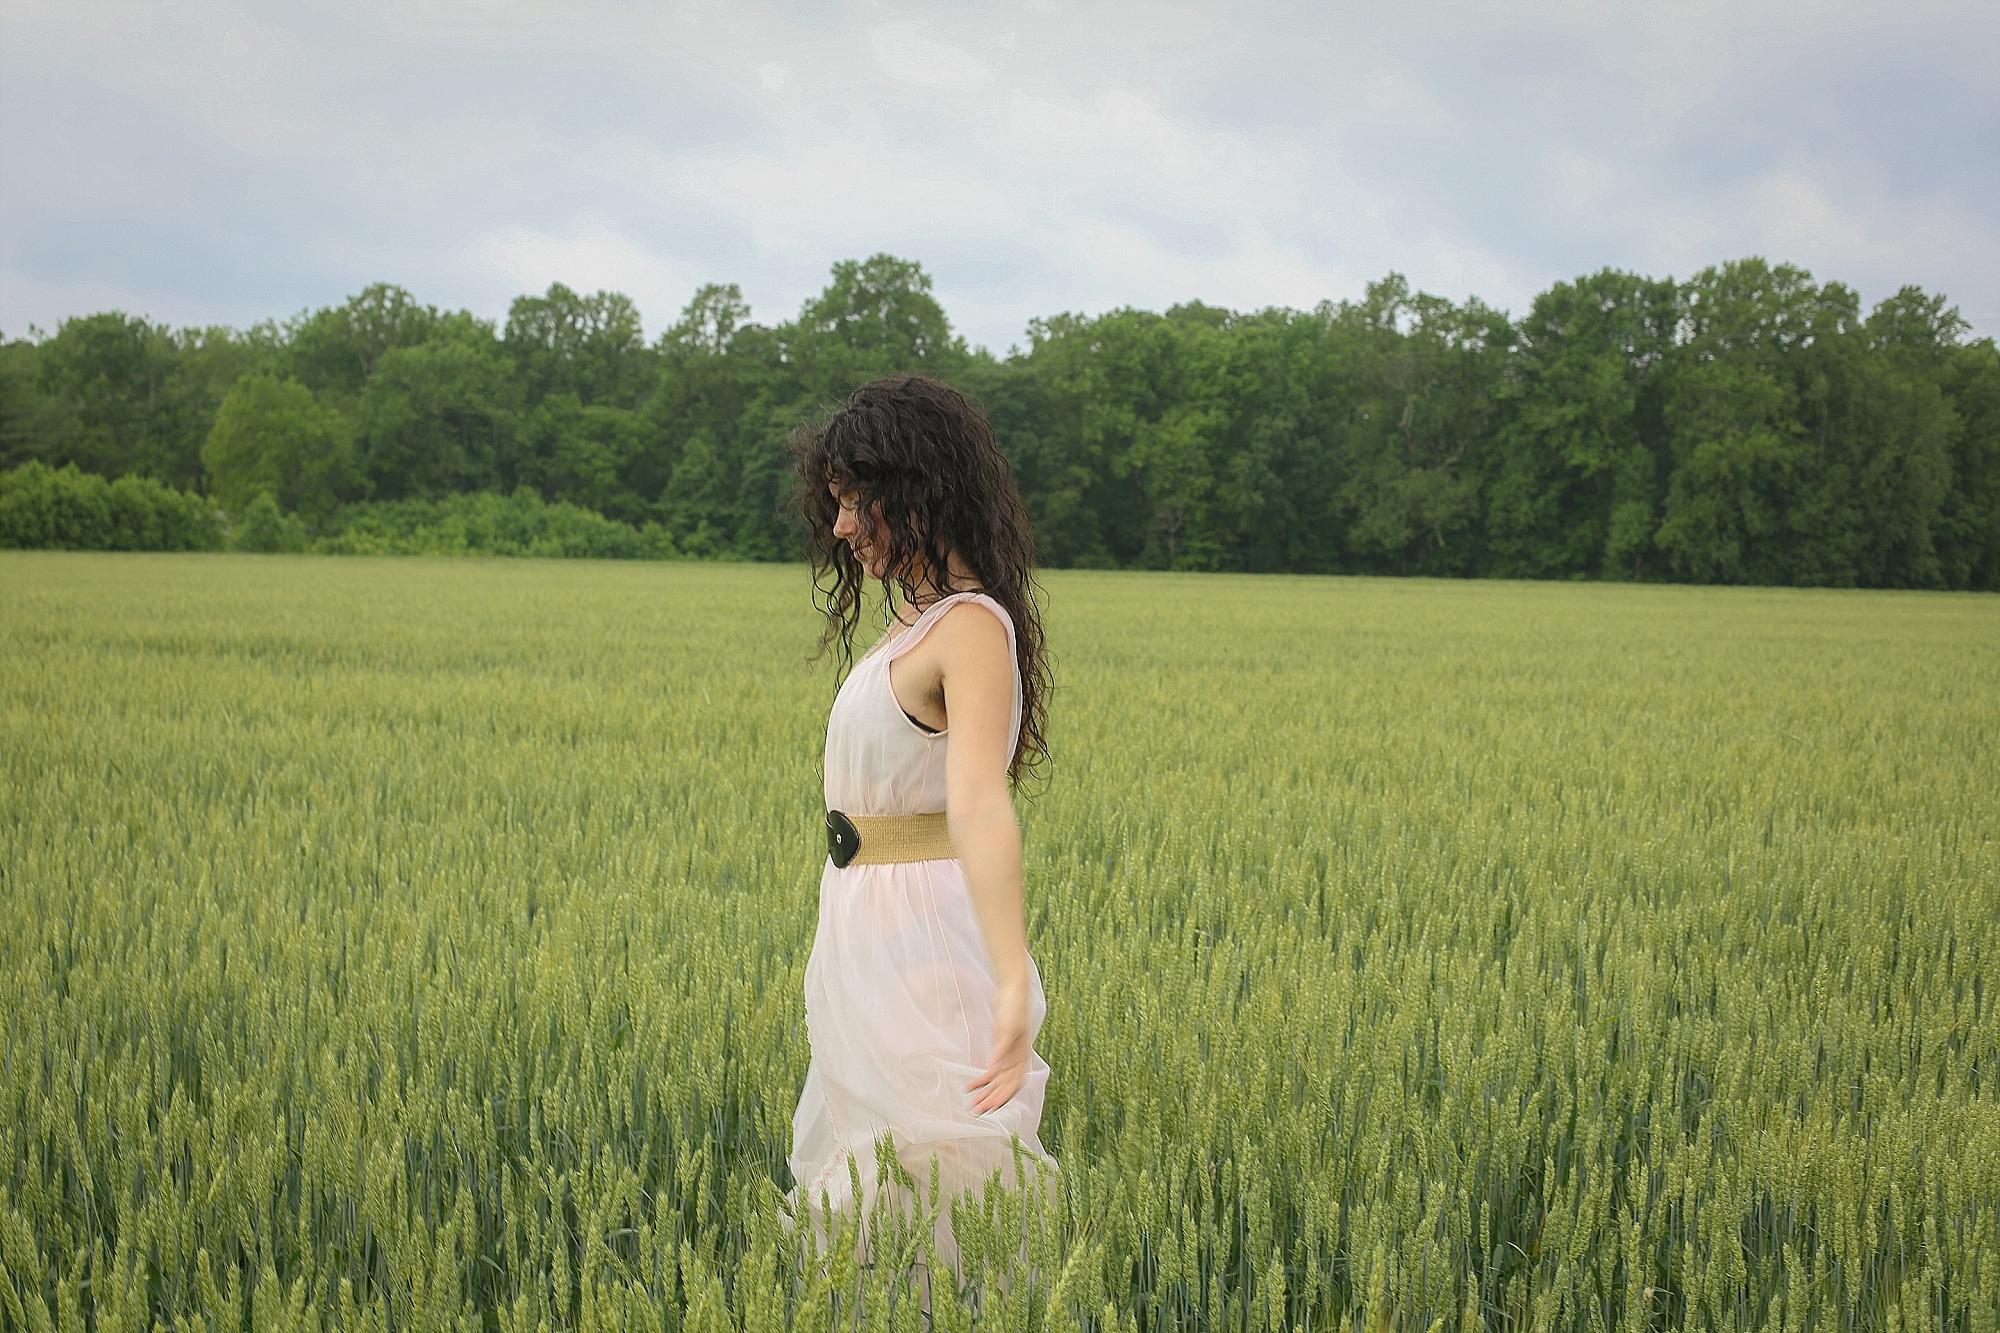 Chesapeak-Reedville-Virginia-Creative-Portrait-Photography_0001.jpg